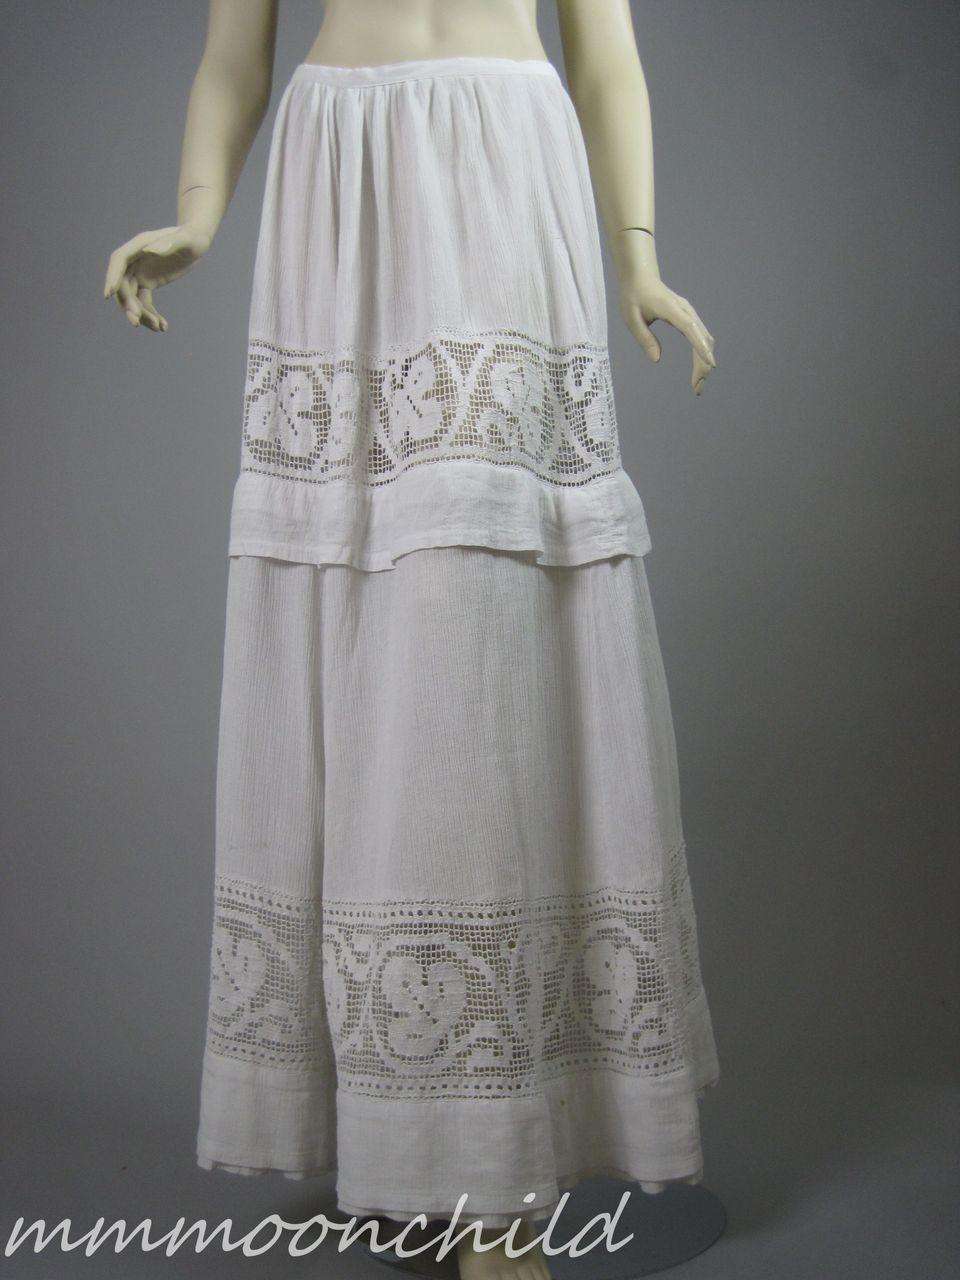 Vintage Edwardian era Skirt Cotton and Lace HM25